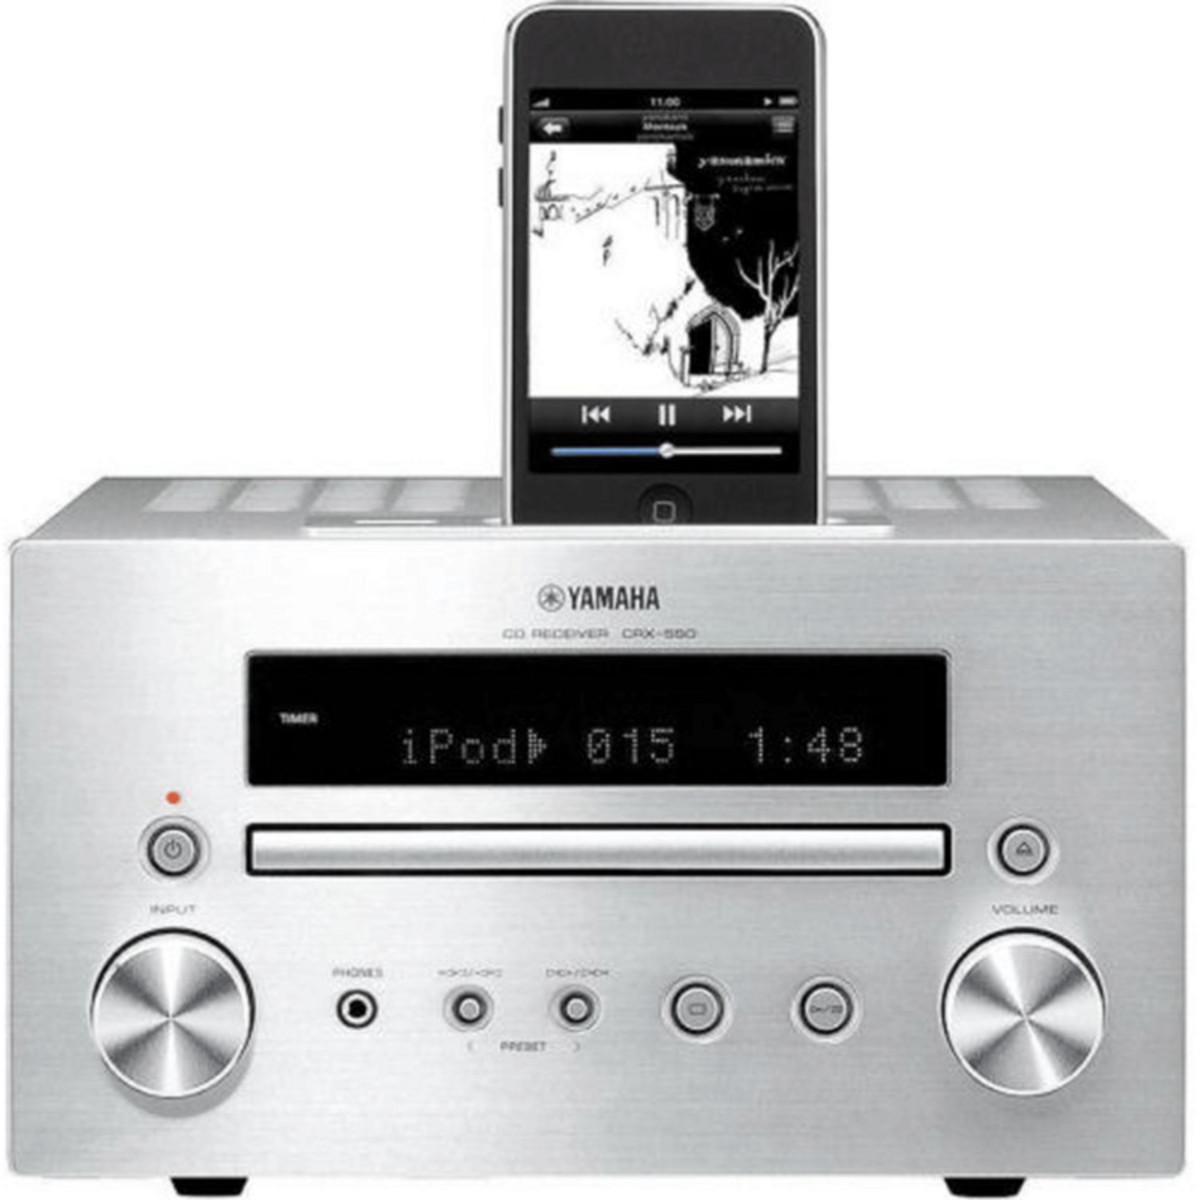 Disc yamaha crx 550 mini sound system with ipod dock for Yamaha sound dock